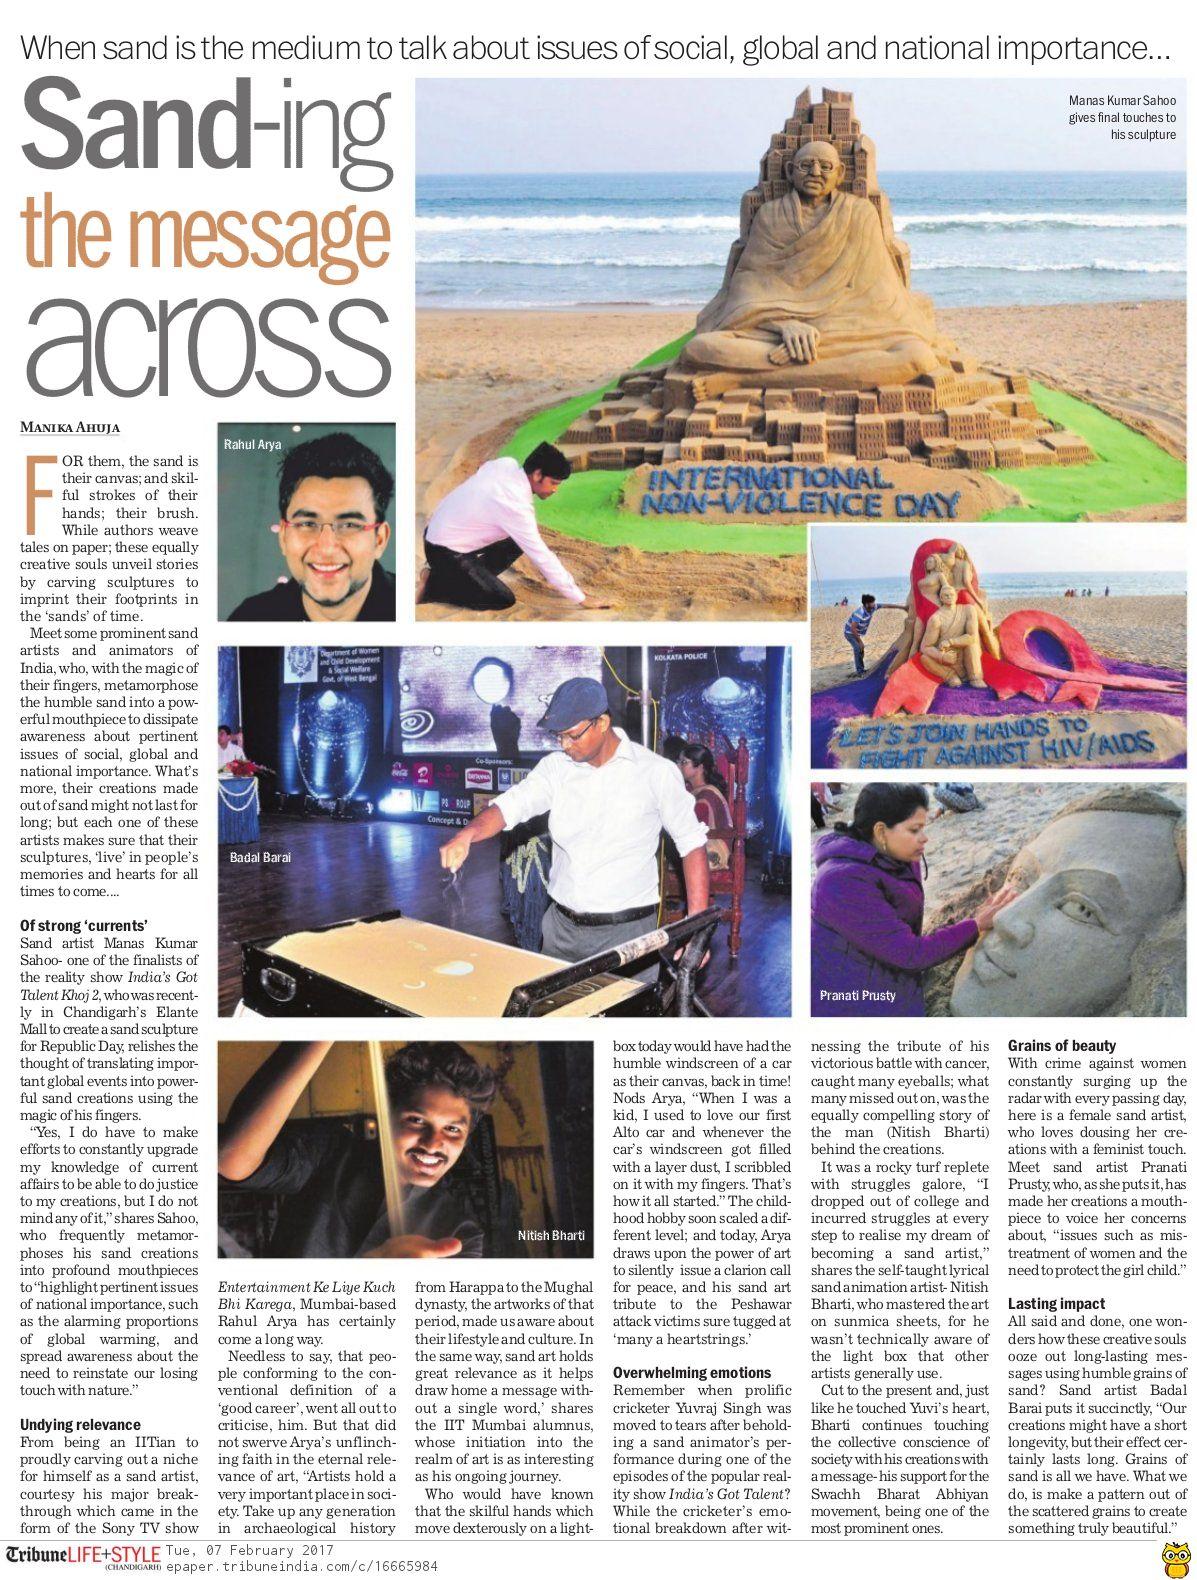 sand-artist-badal-barai-left-middle